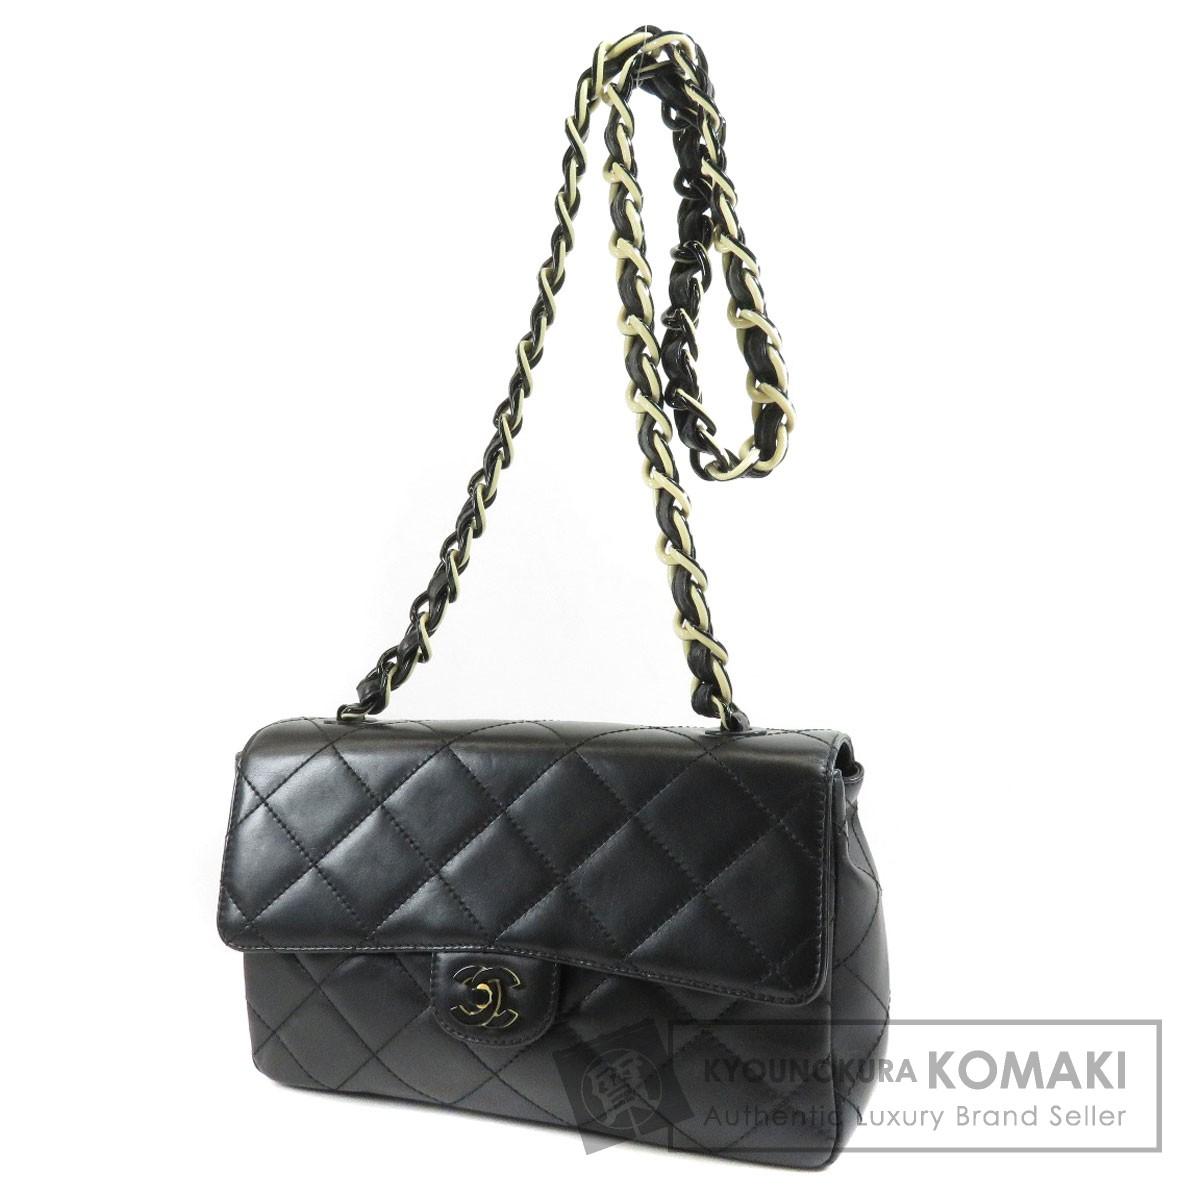 b2a0097d75 Kyonokura Komaki Brand Cheapest Challenger: Authentic CHANEL stitch ...